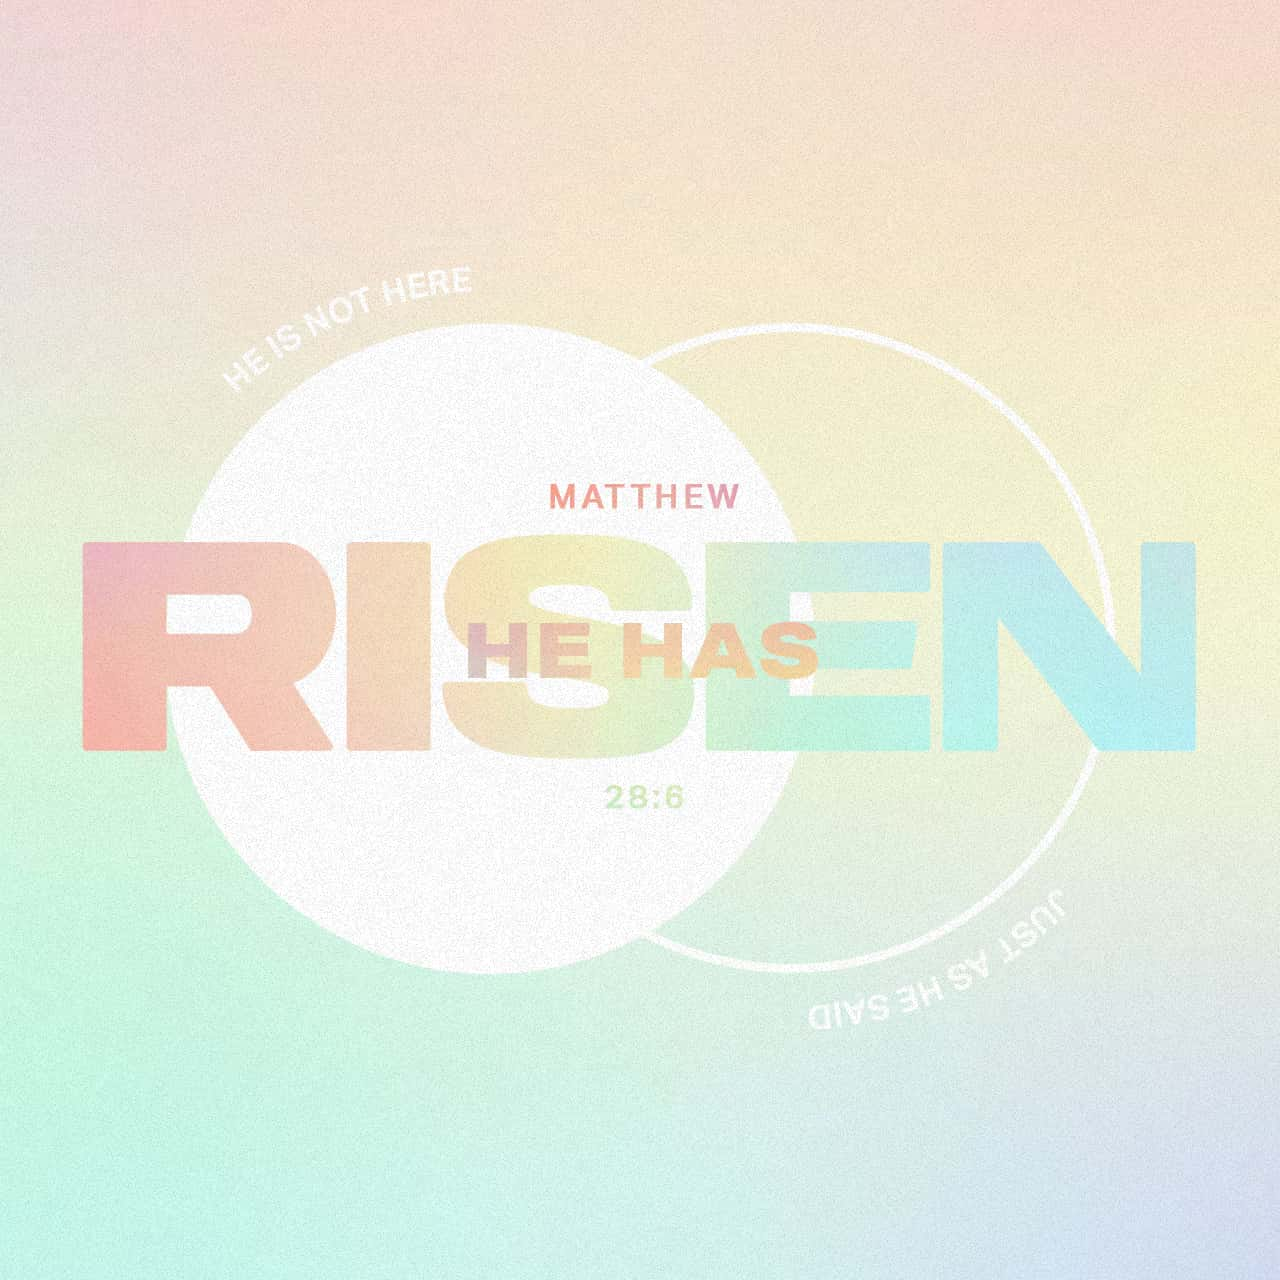 He Has Risen - Matthew 28:6 - Verse Image